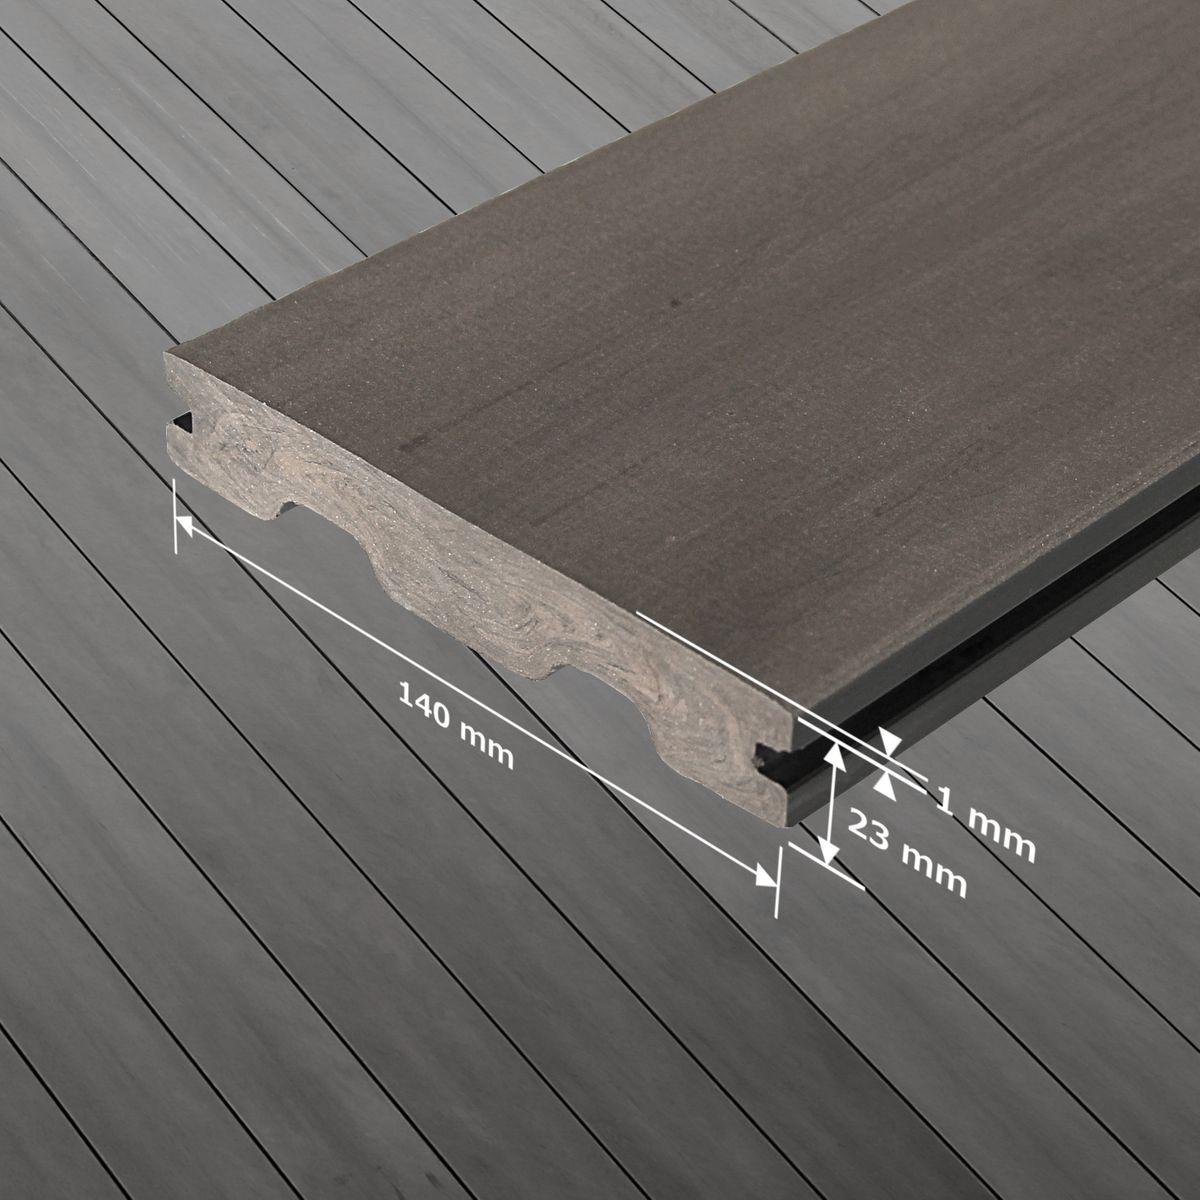 Muster Bpc Terrassendielen Terrassenboden Premium Wpc Bambus Dielen